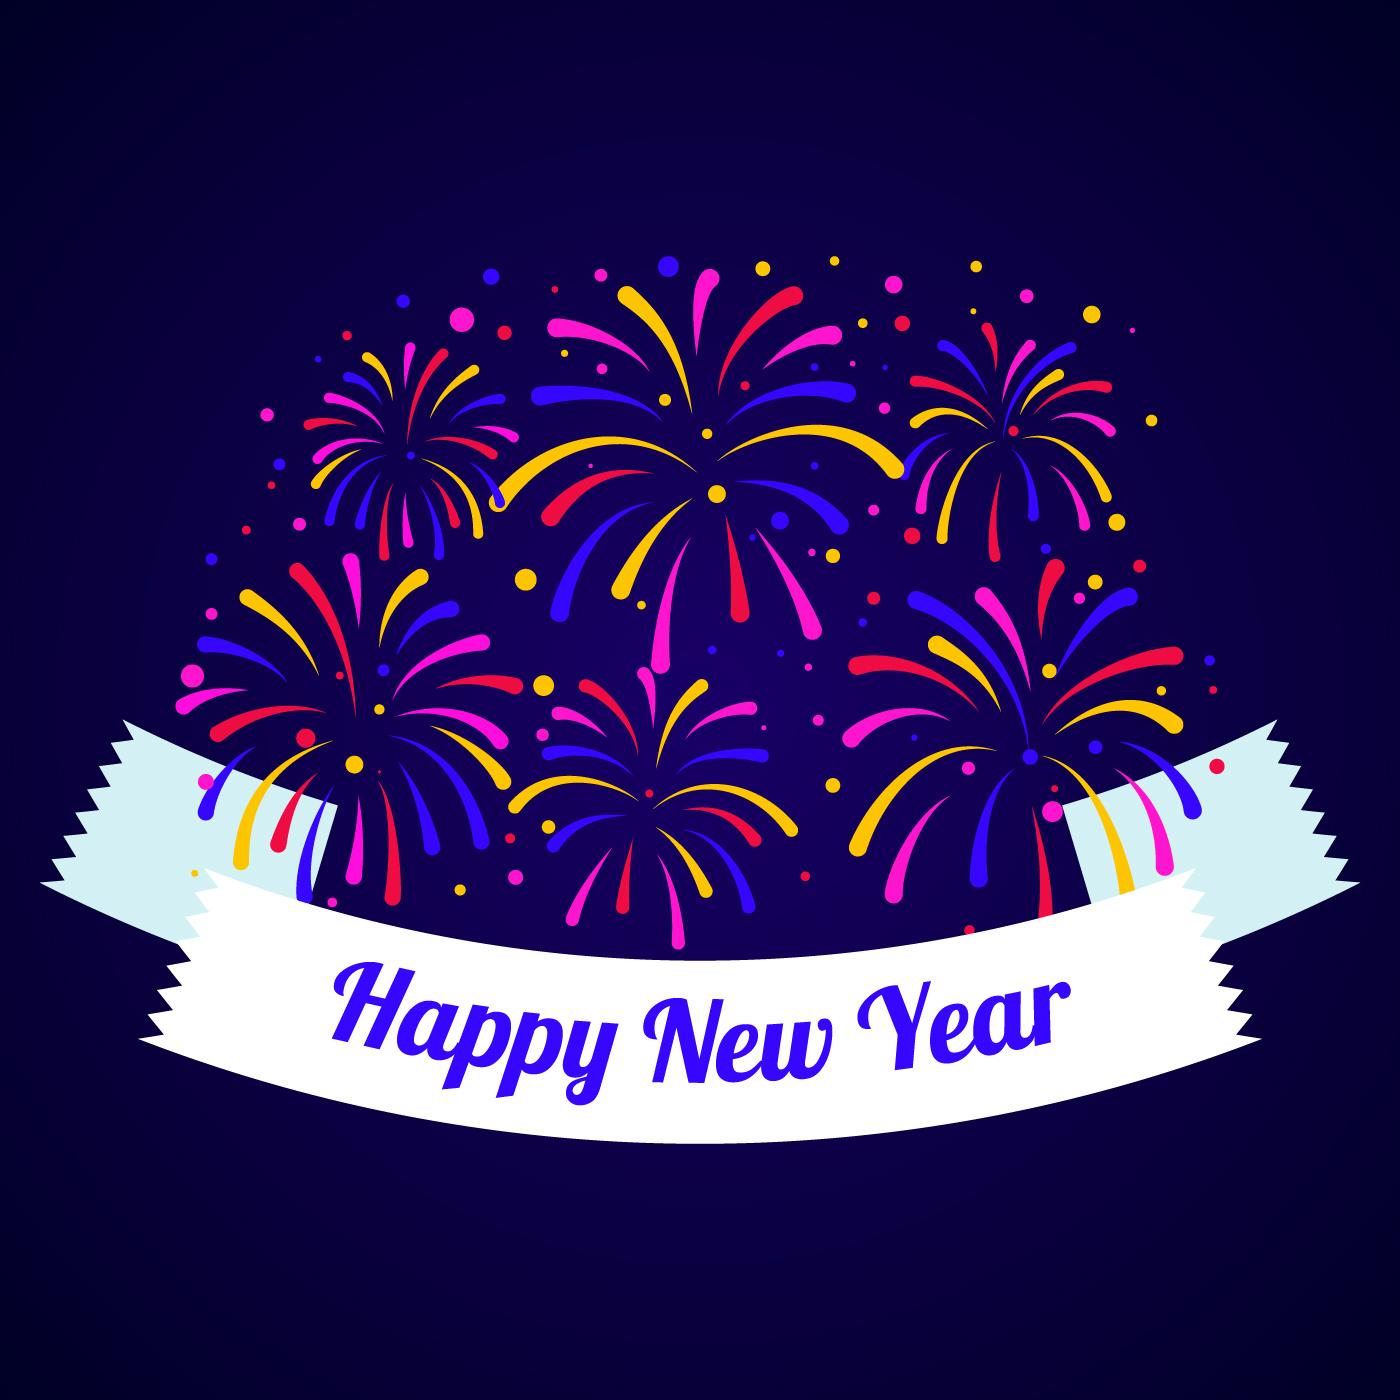 Happy New Year Fireworks Download Free Vectors Clipart Graphics Vector Art